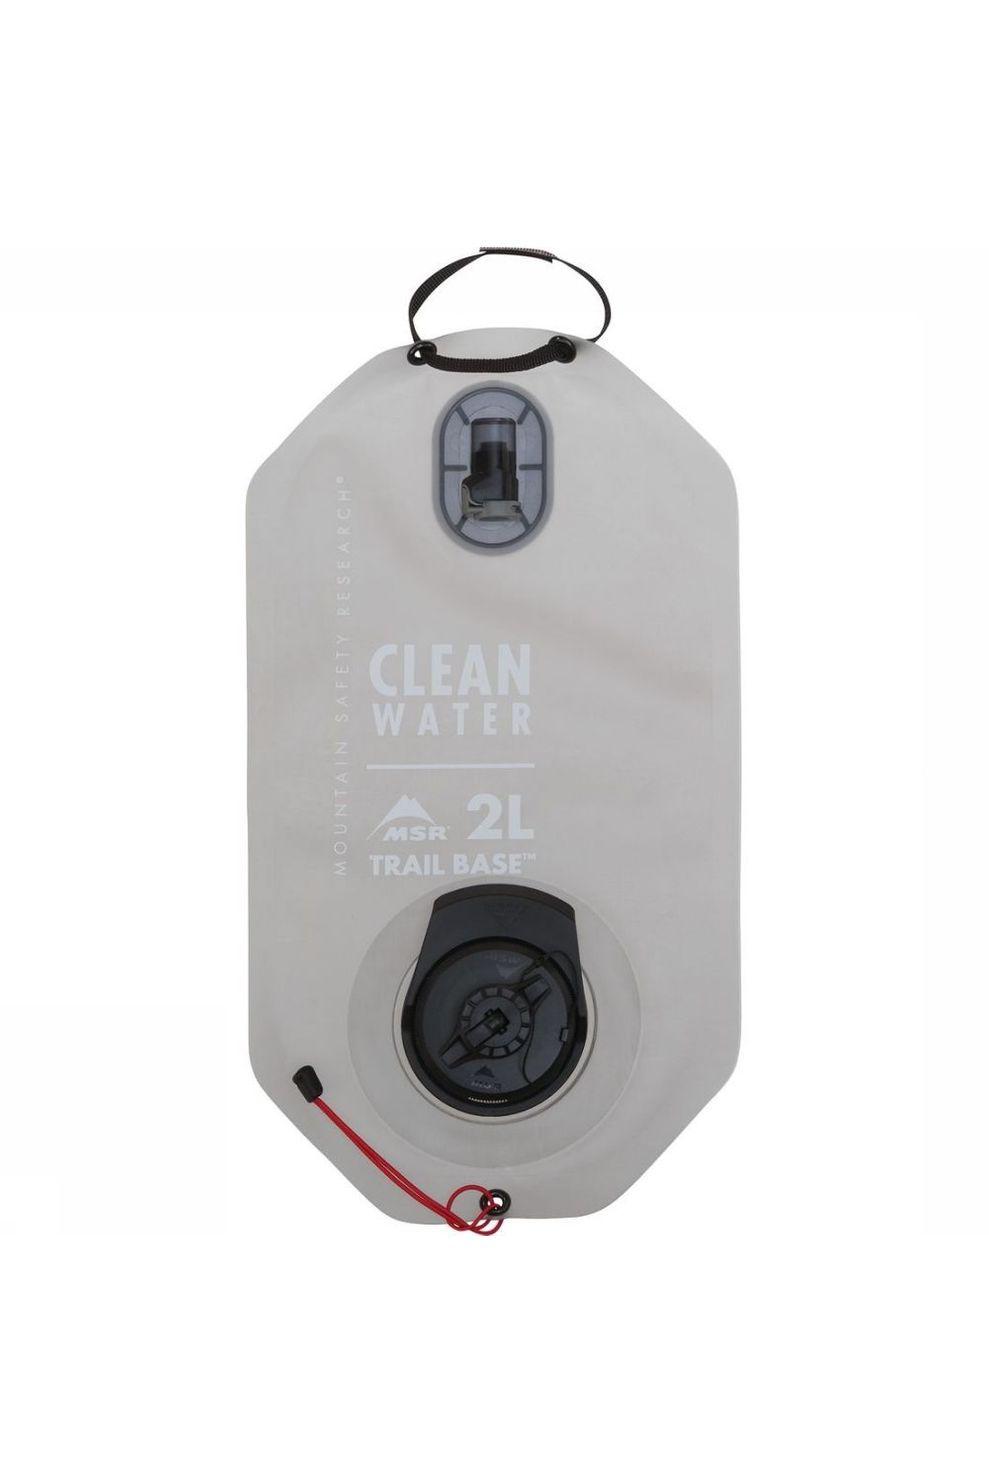 MSR Diverse Trail Base Water Filter 2L - - Transparant